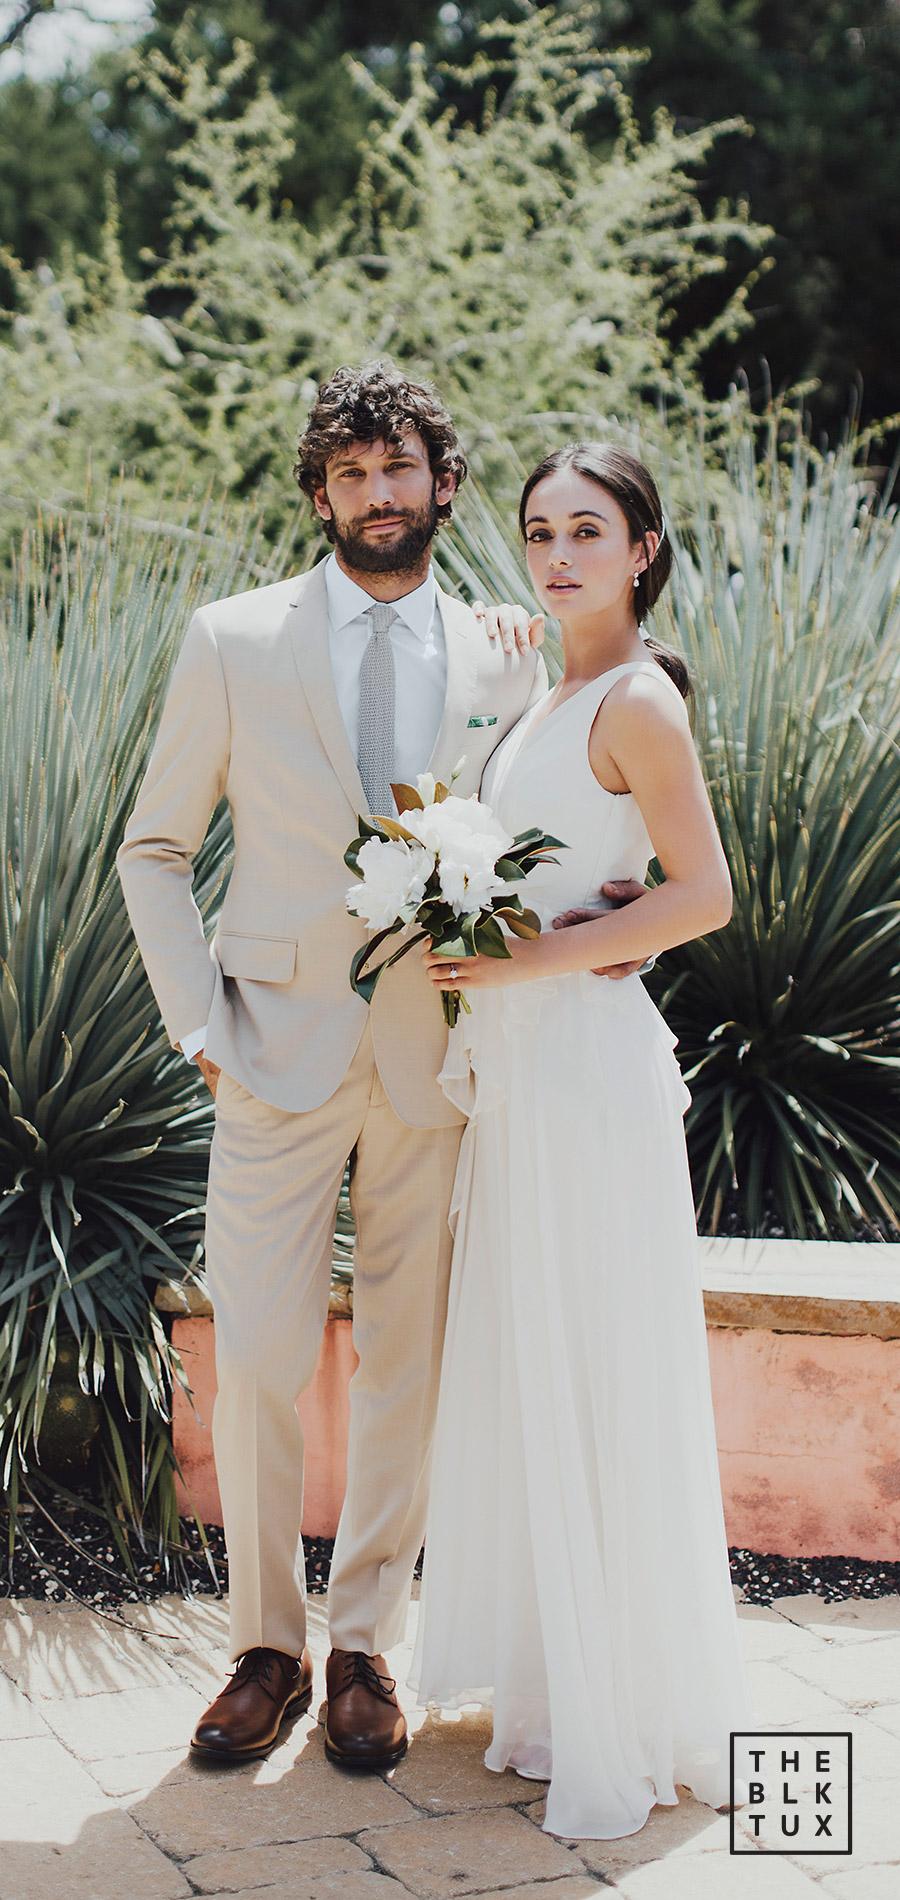 modest wedding dresses in phoenix az wedding gown rental Modest Wedding Dresses In Phoenix Az 56